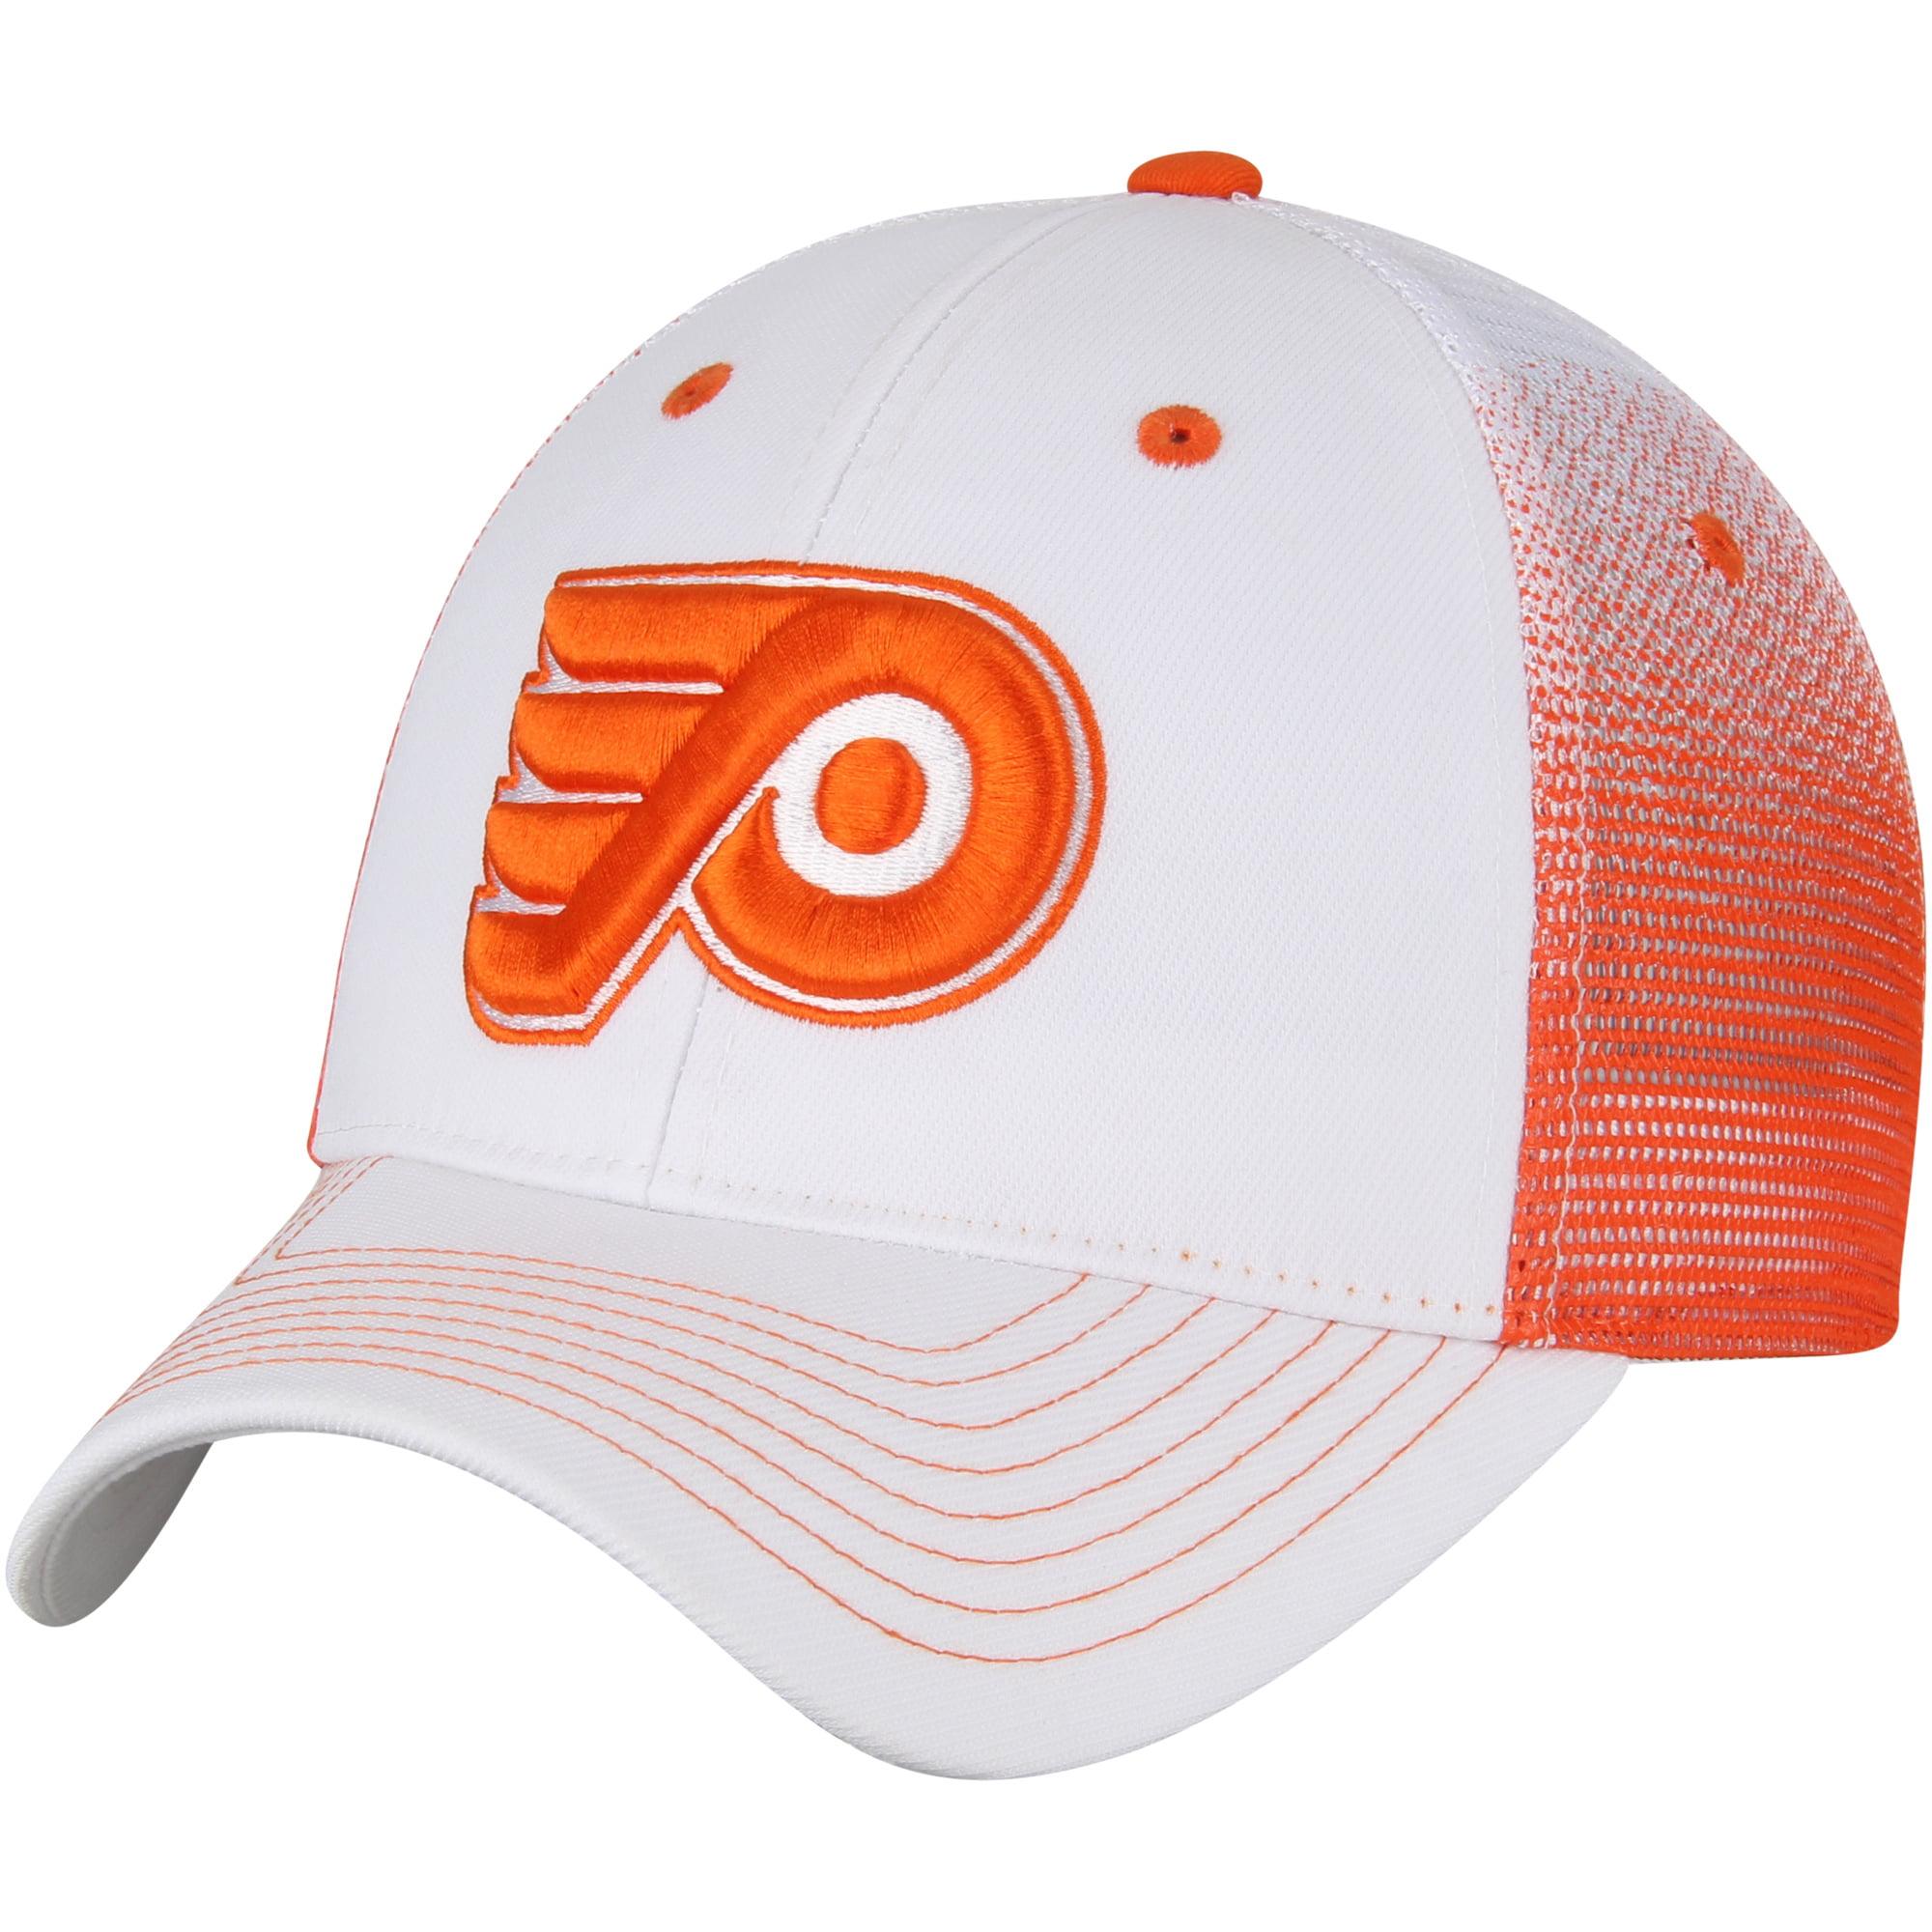 1b71c1b9d7f75 ... wholesale philadelphia flyers zephyr jolt trucker adjustable snapback  hat white orange osfa 33e67 051f9